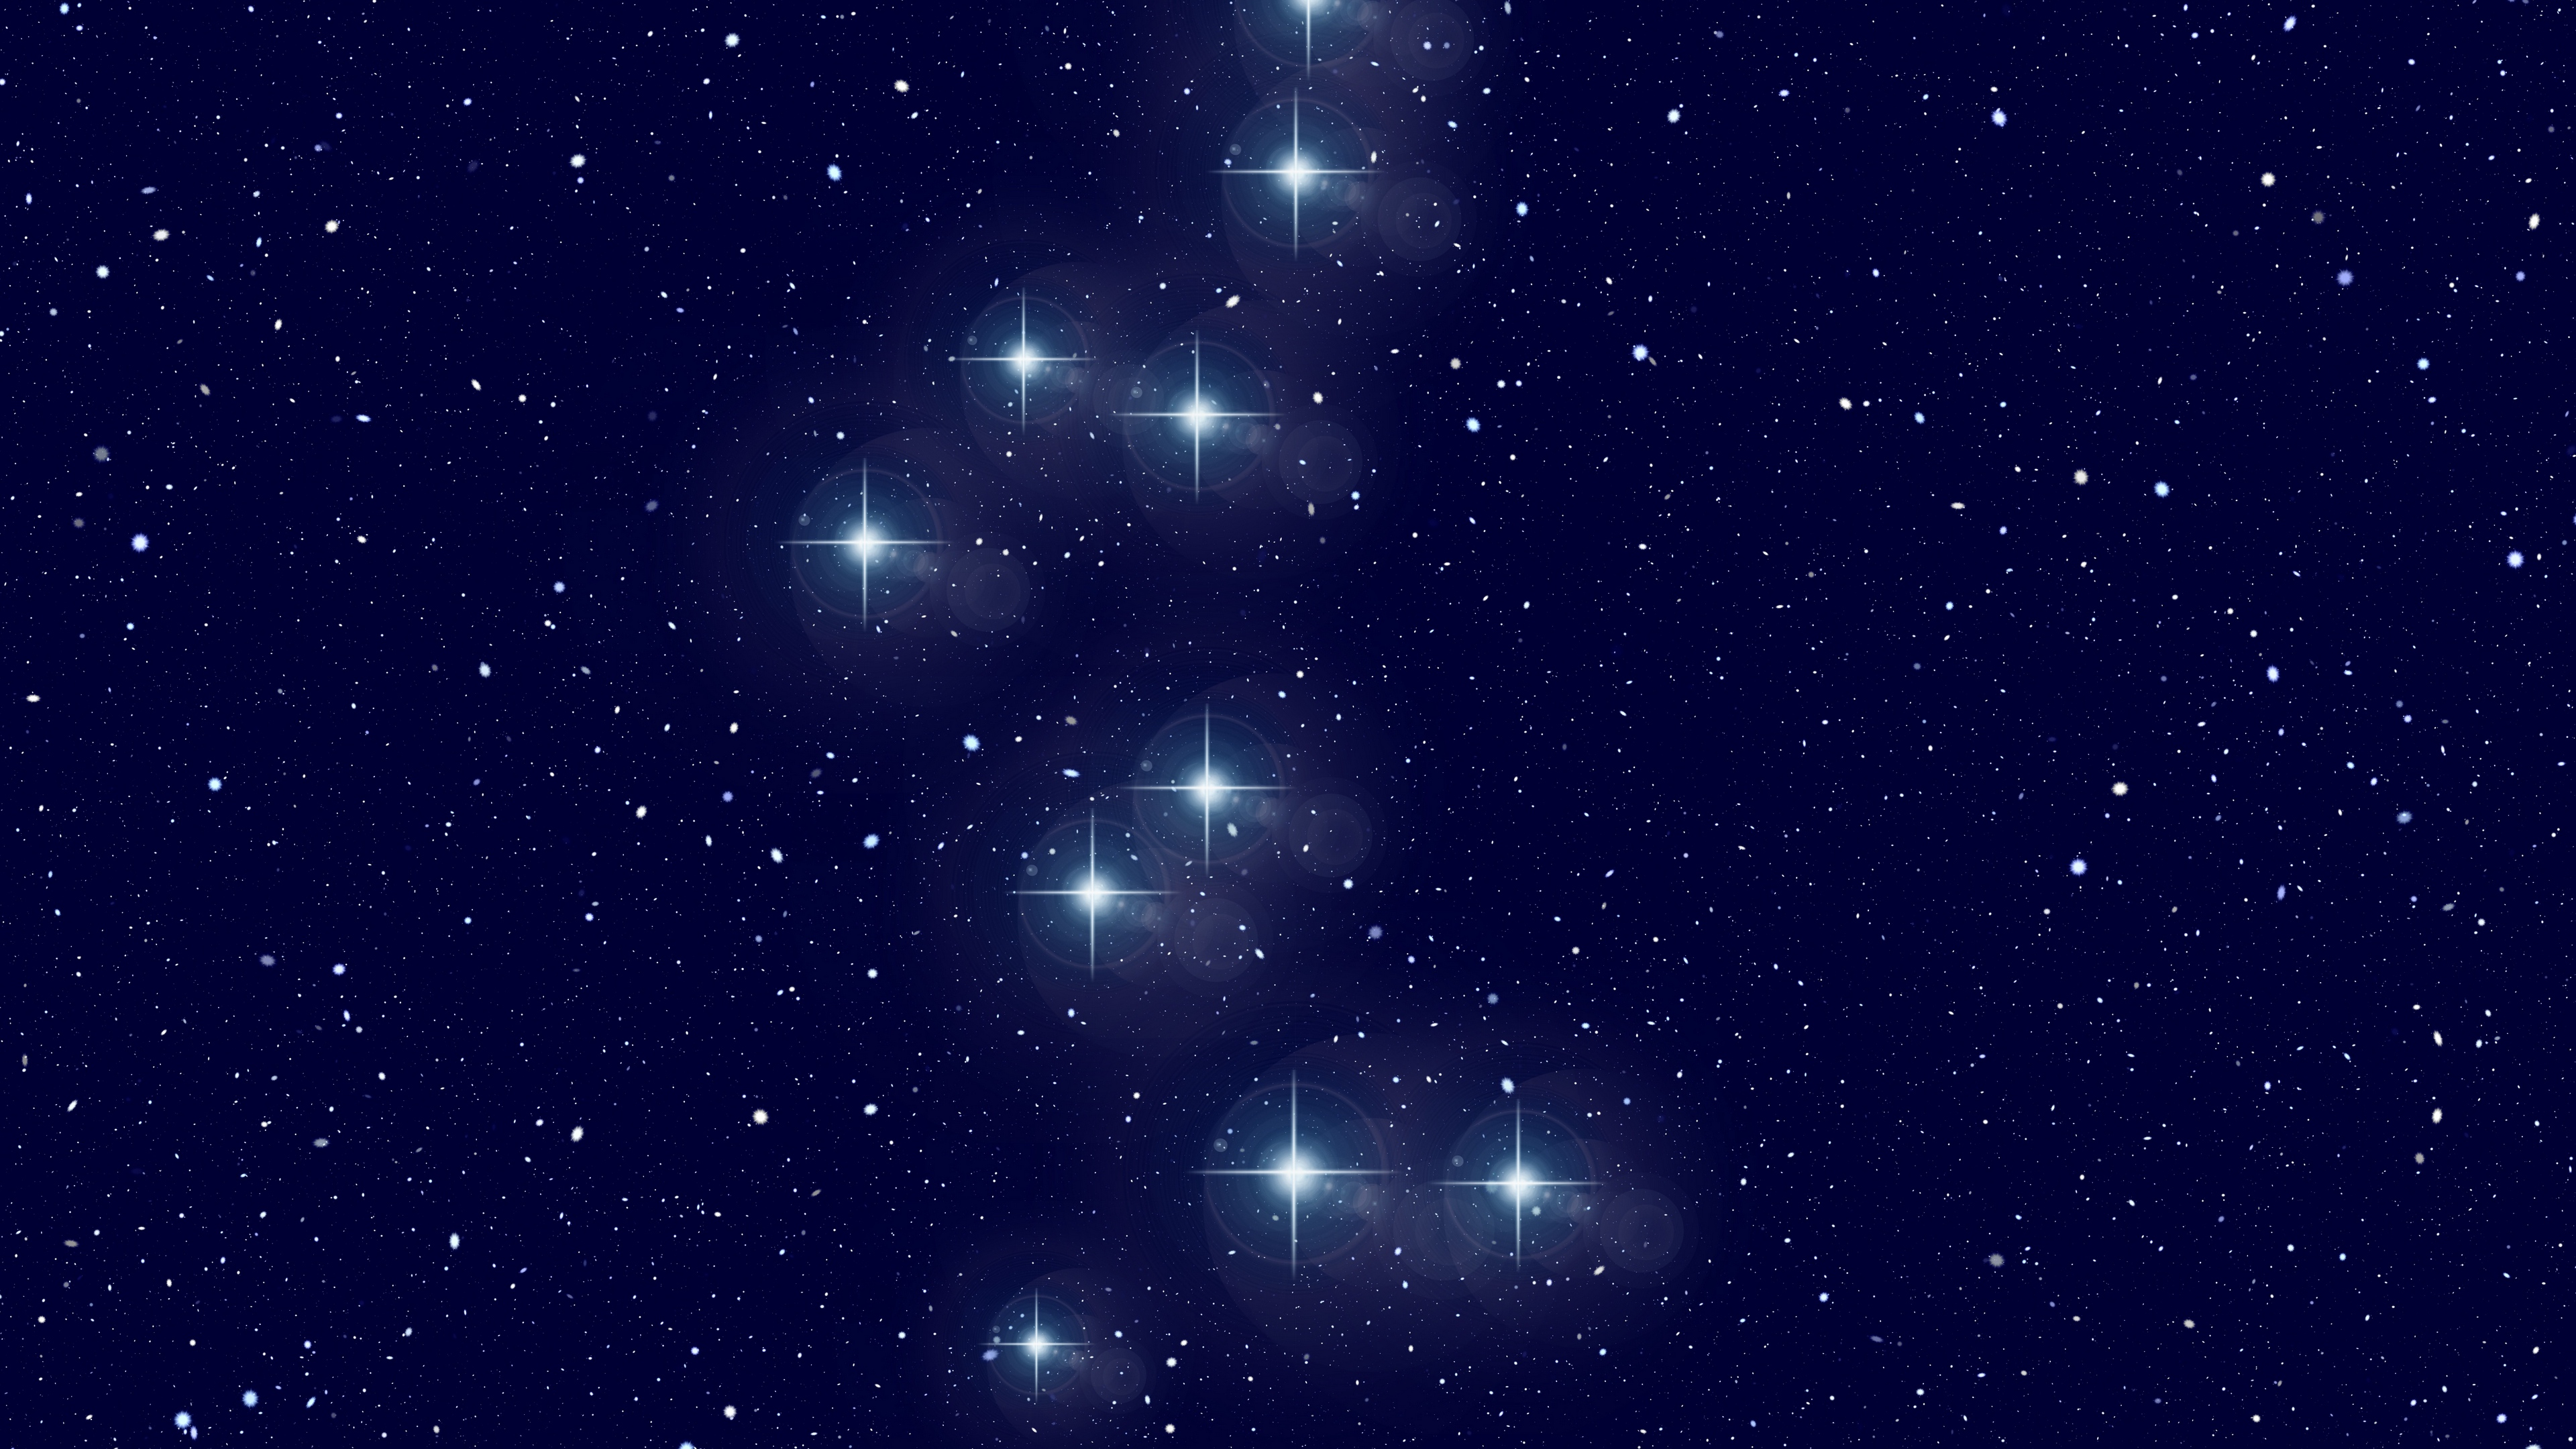 constellation bear starry sky galaxy astronomy 4k 1536013911 - constellation, bear, starry sky, galaxy, astronomy 4k - starry sky, constellation, Bear